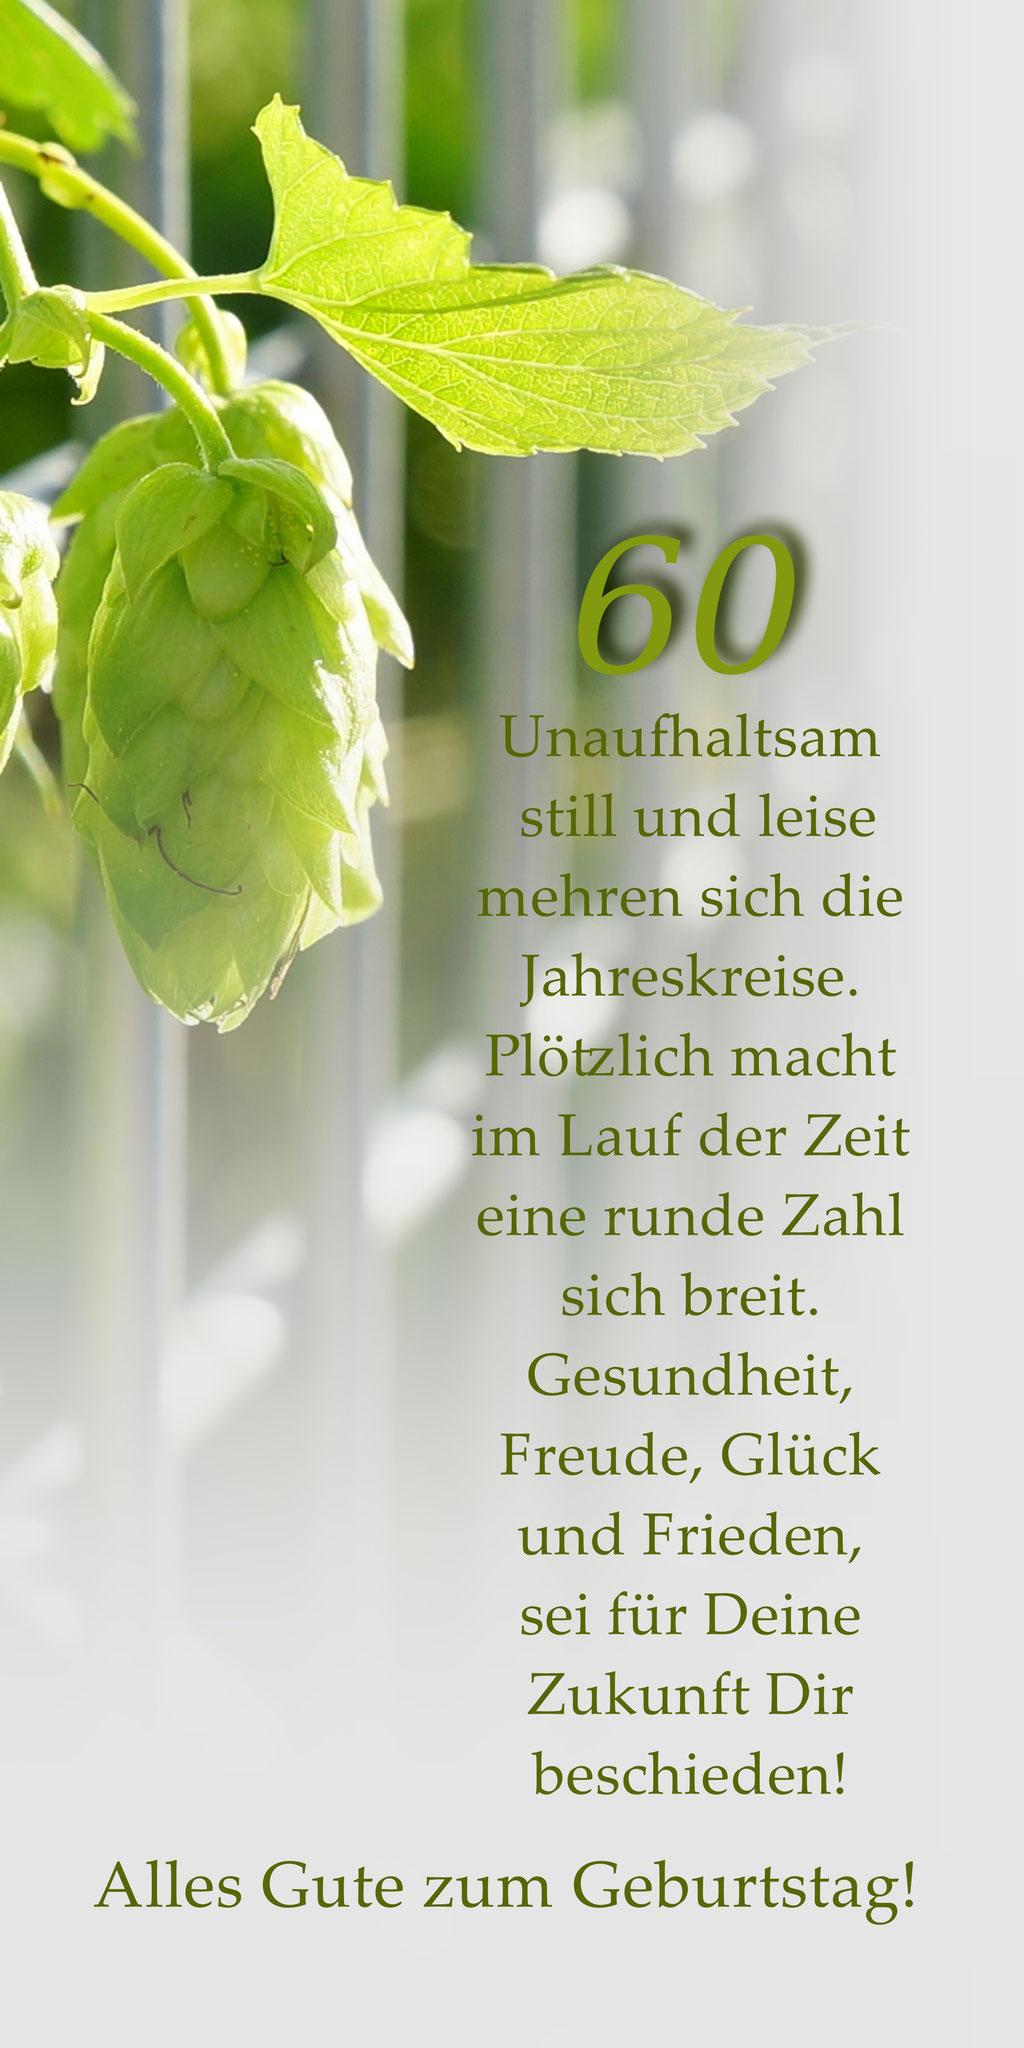 "Klappkarte GTK 60  zum runden Geburtstag  ""Hopfendolde Zaun"